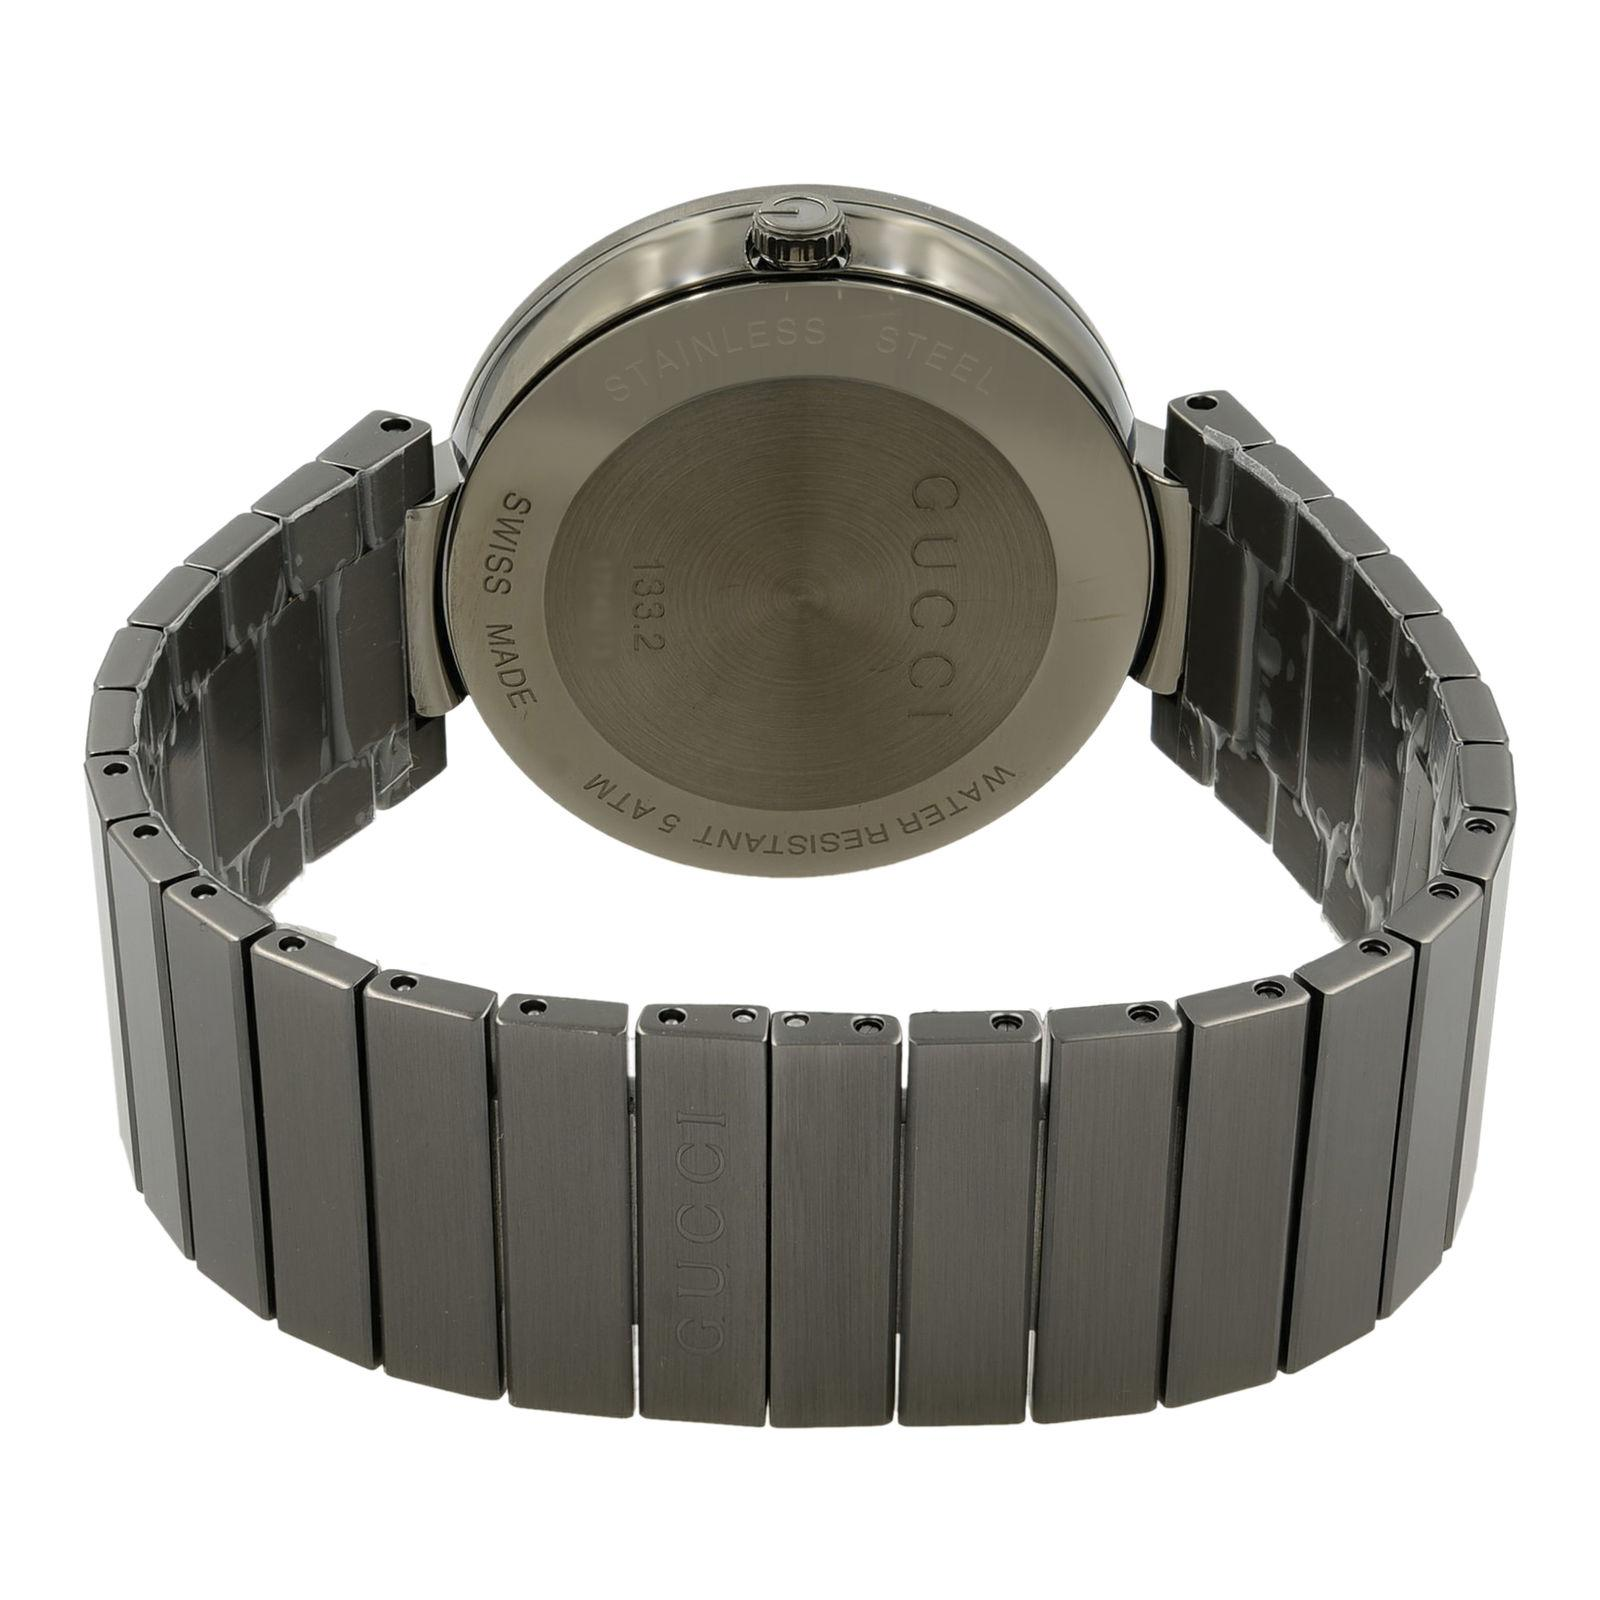 56fe3383485 Gucci Interlocking G Grey PVD Steel Anthracite Dial Quartz Men s Watch  YA133210 For Sale at 1stdibs